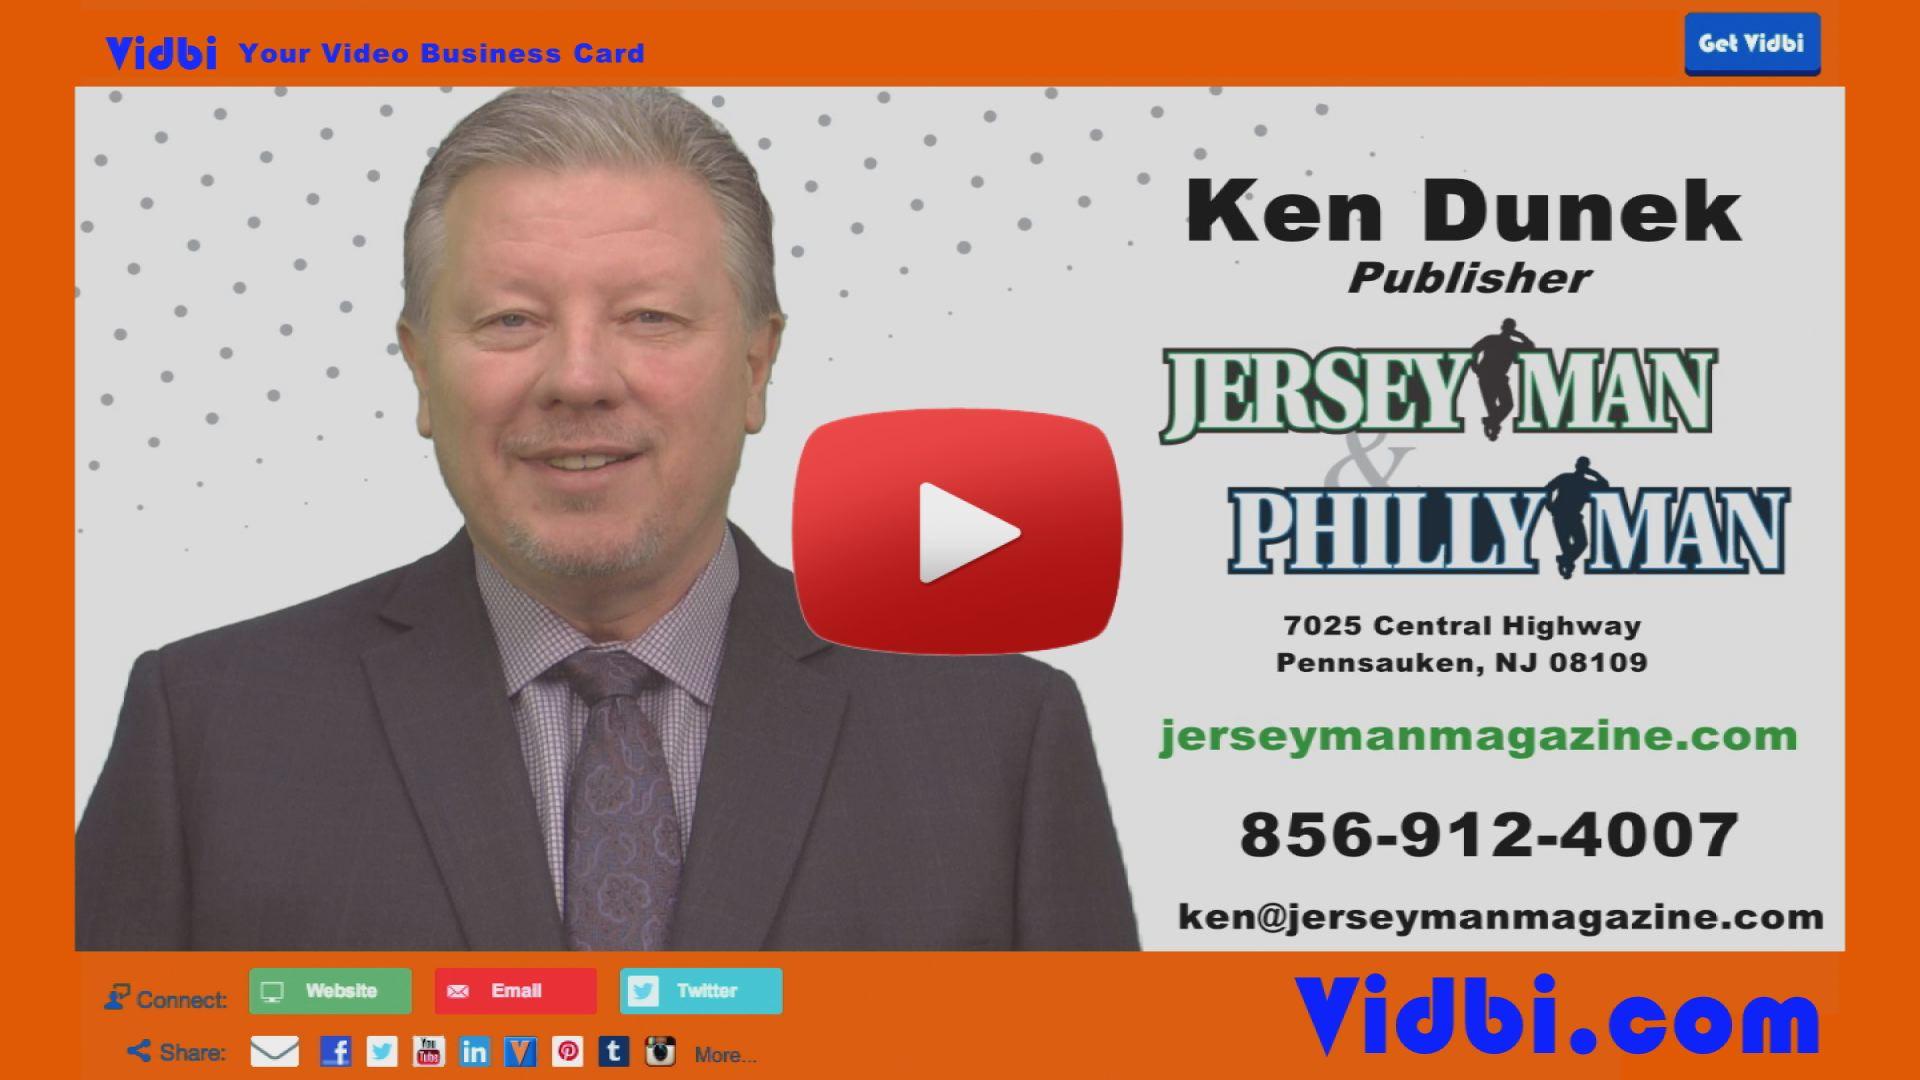 Ken Dunek - JerseyMan PhillyMan Magazine Vidbi